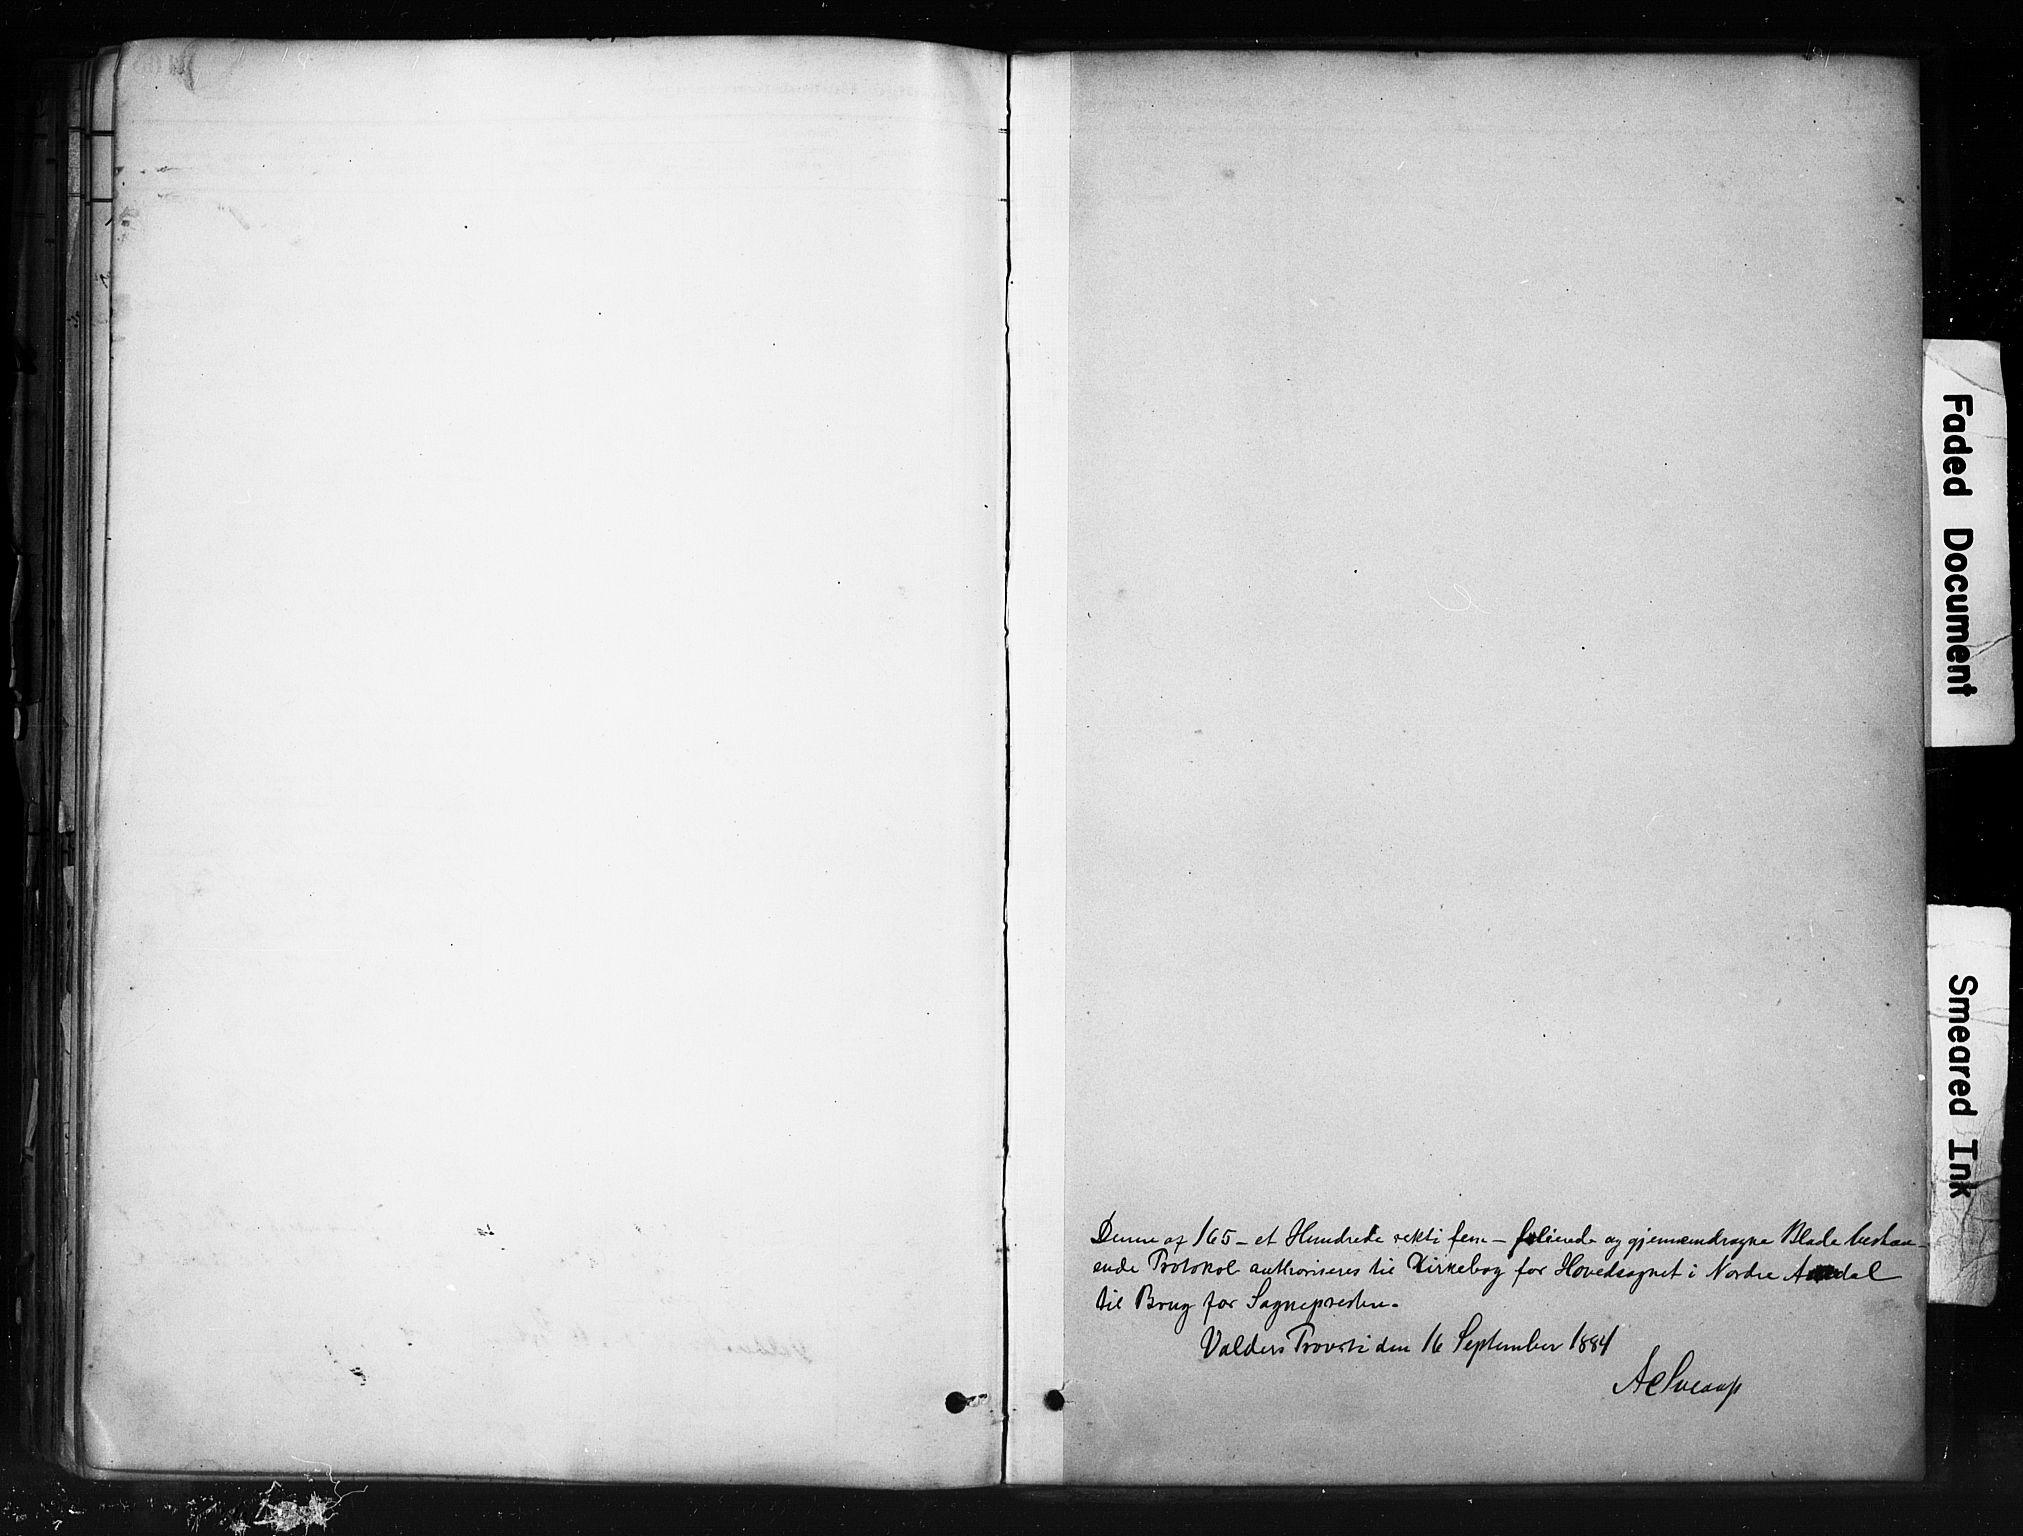 SAH, Nord-Aurdal prestekontor, Ministerialbok nr. 13, 1883-1895